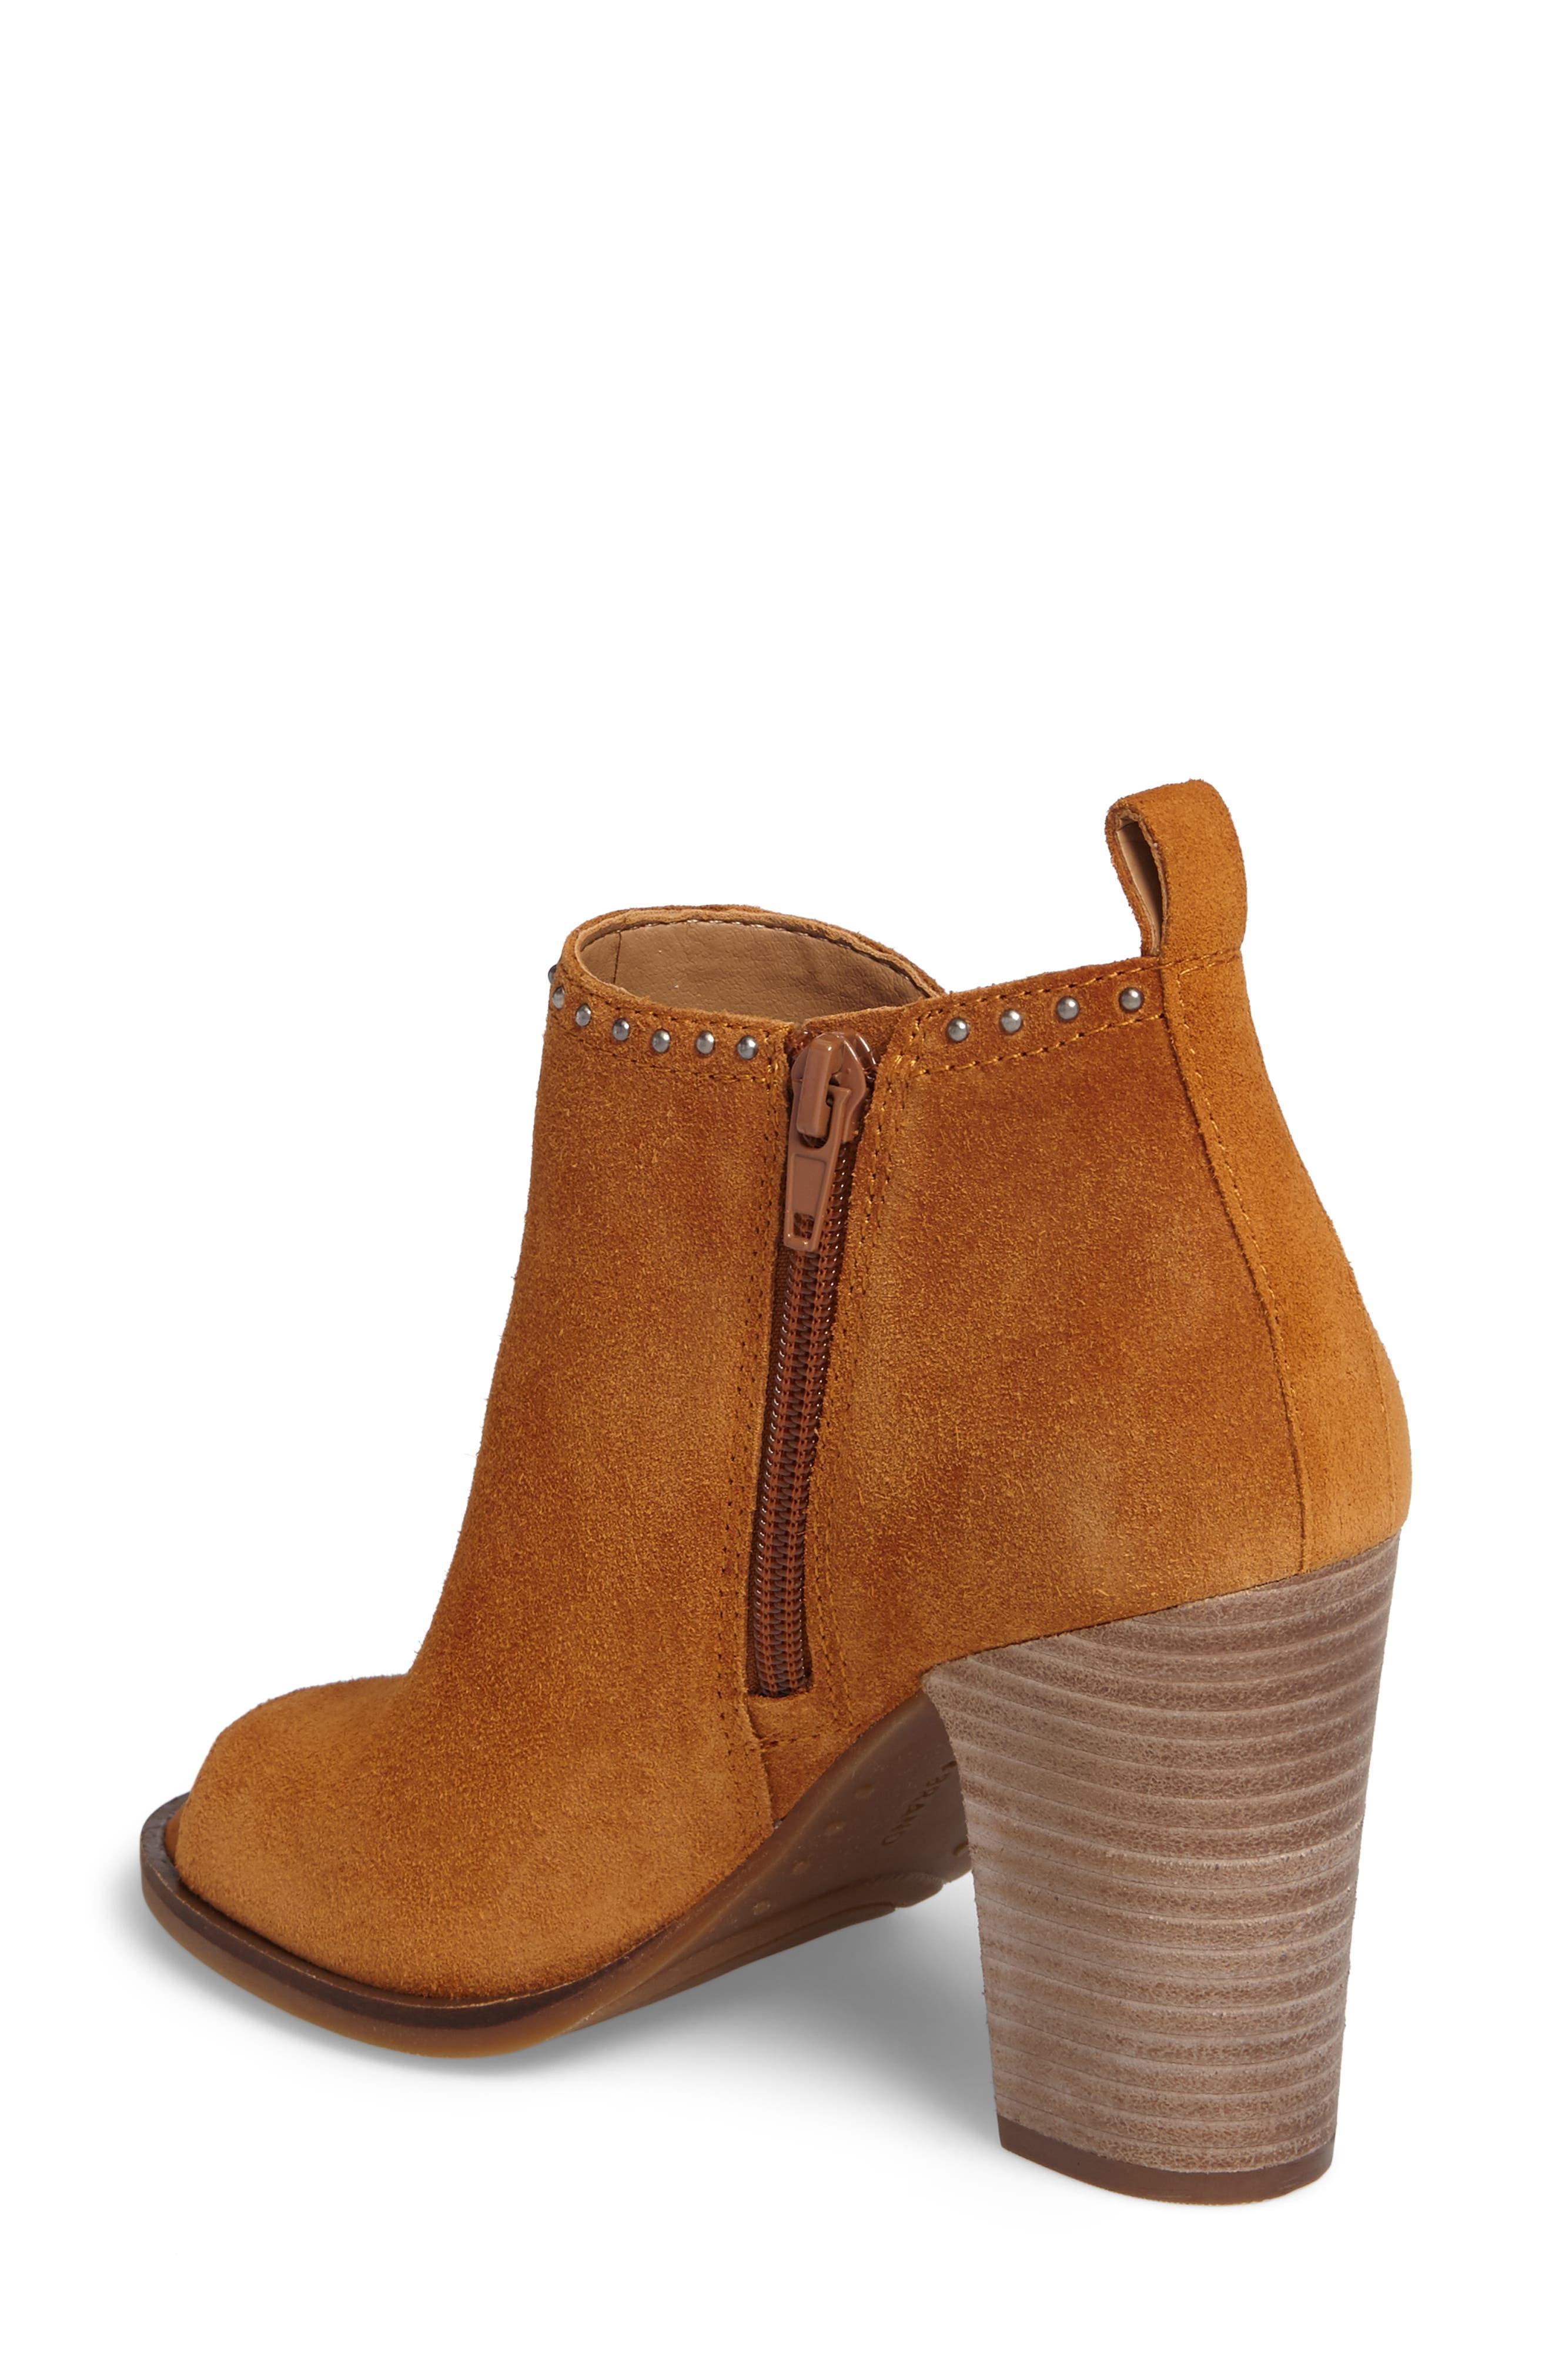 Alternate Image 2  - Lucky Brand Lotisha Studded Open Toe Bootie (Women)